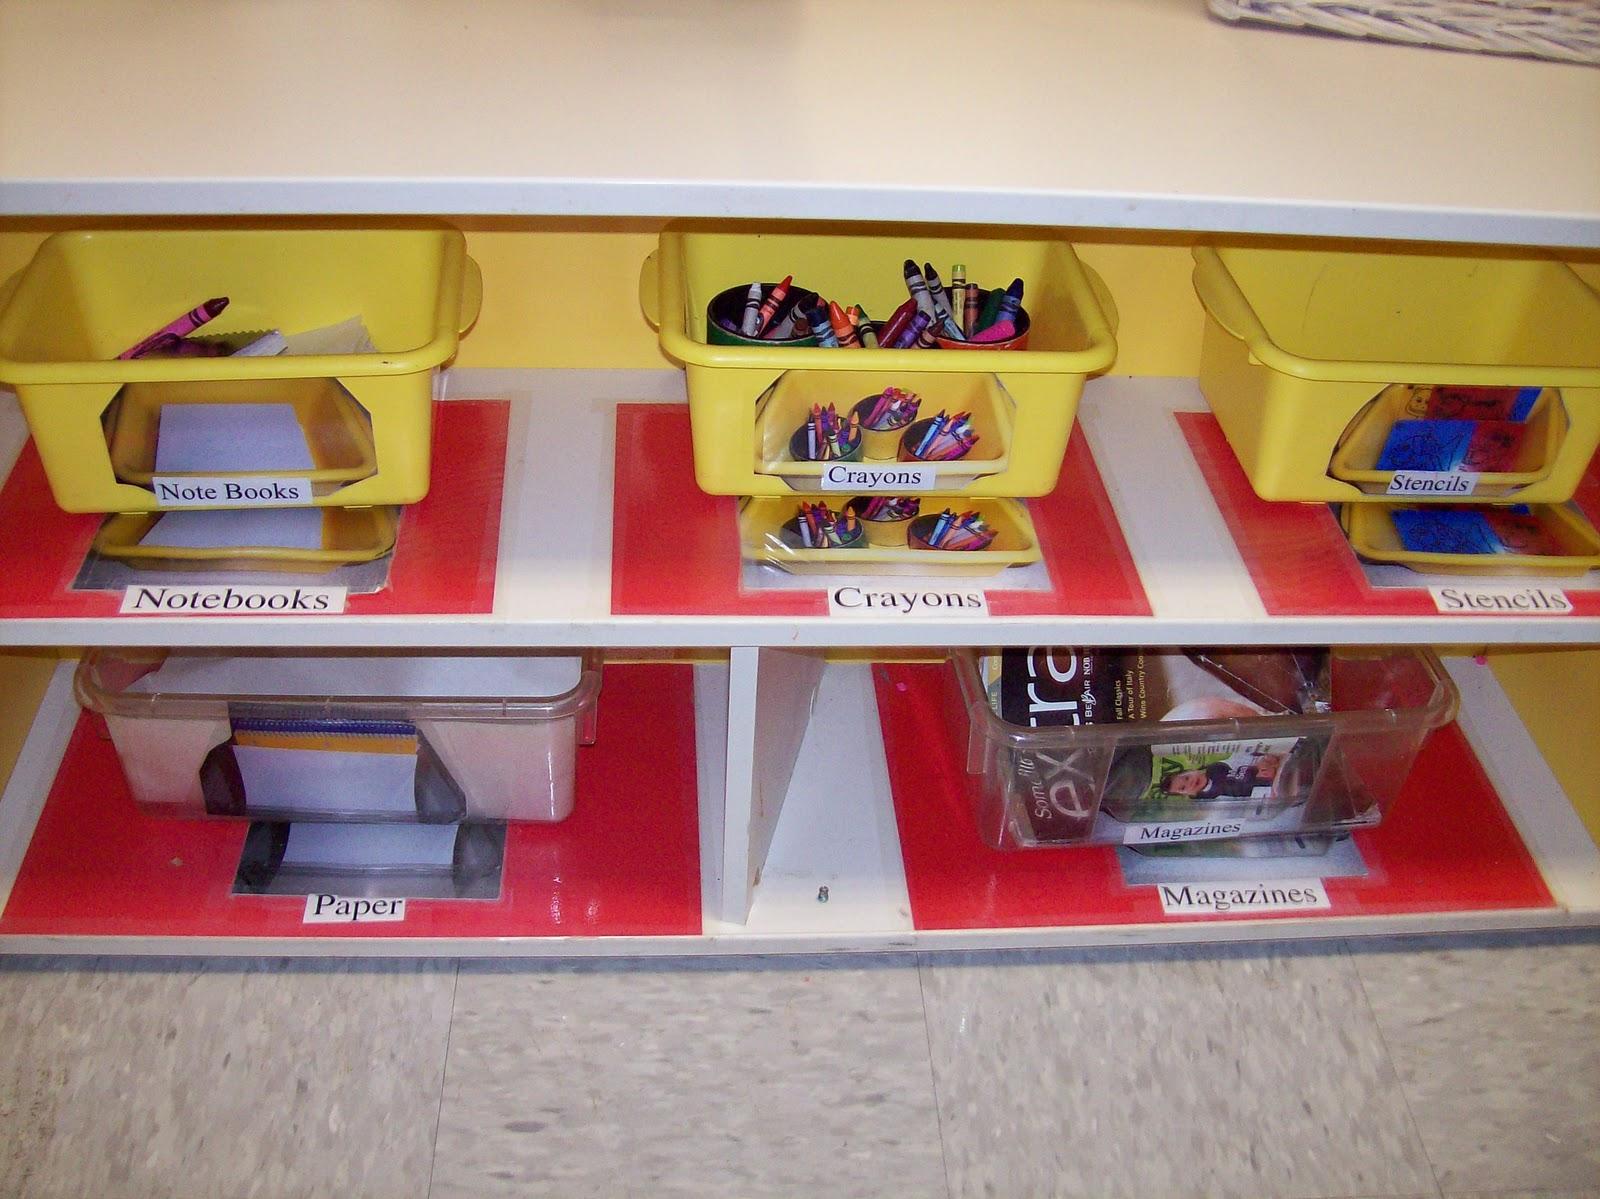 Digital Camera In The Preschool Classroom